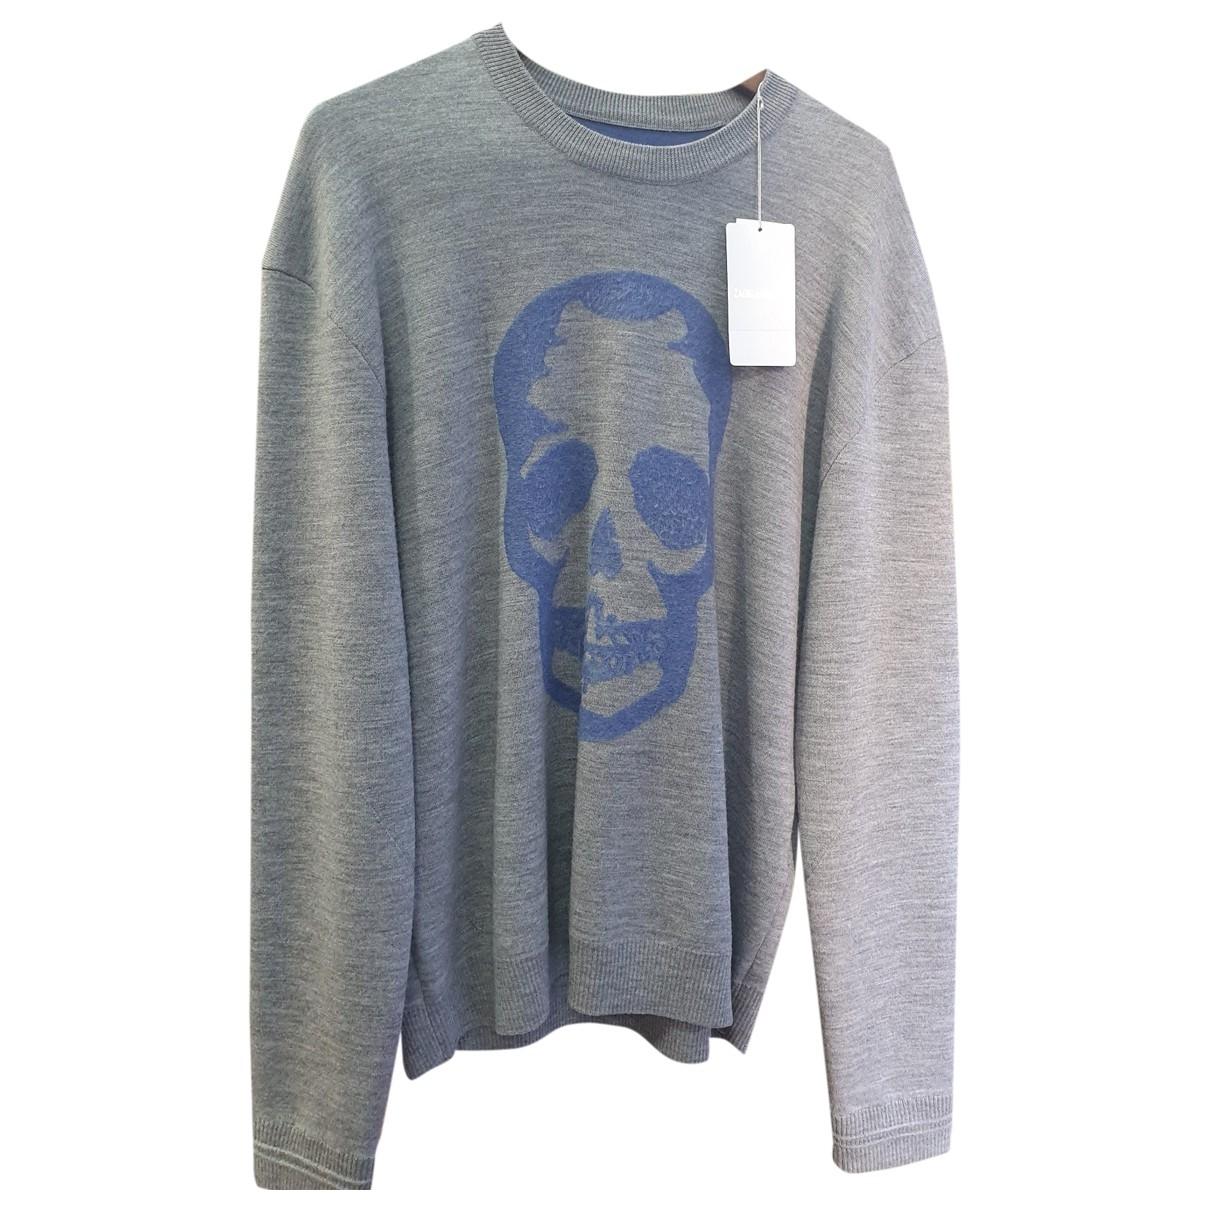 Zadig & Voltaire Spring Summer 2019 Grey Wool Knitwear & Sweatshirts for Men S International